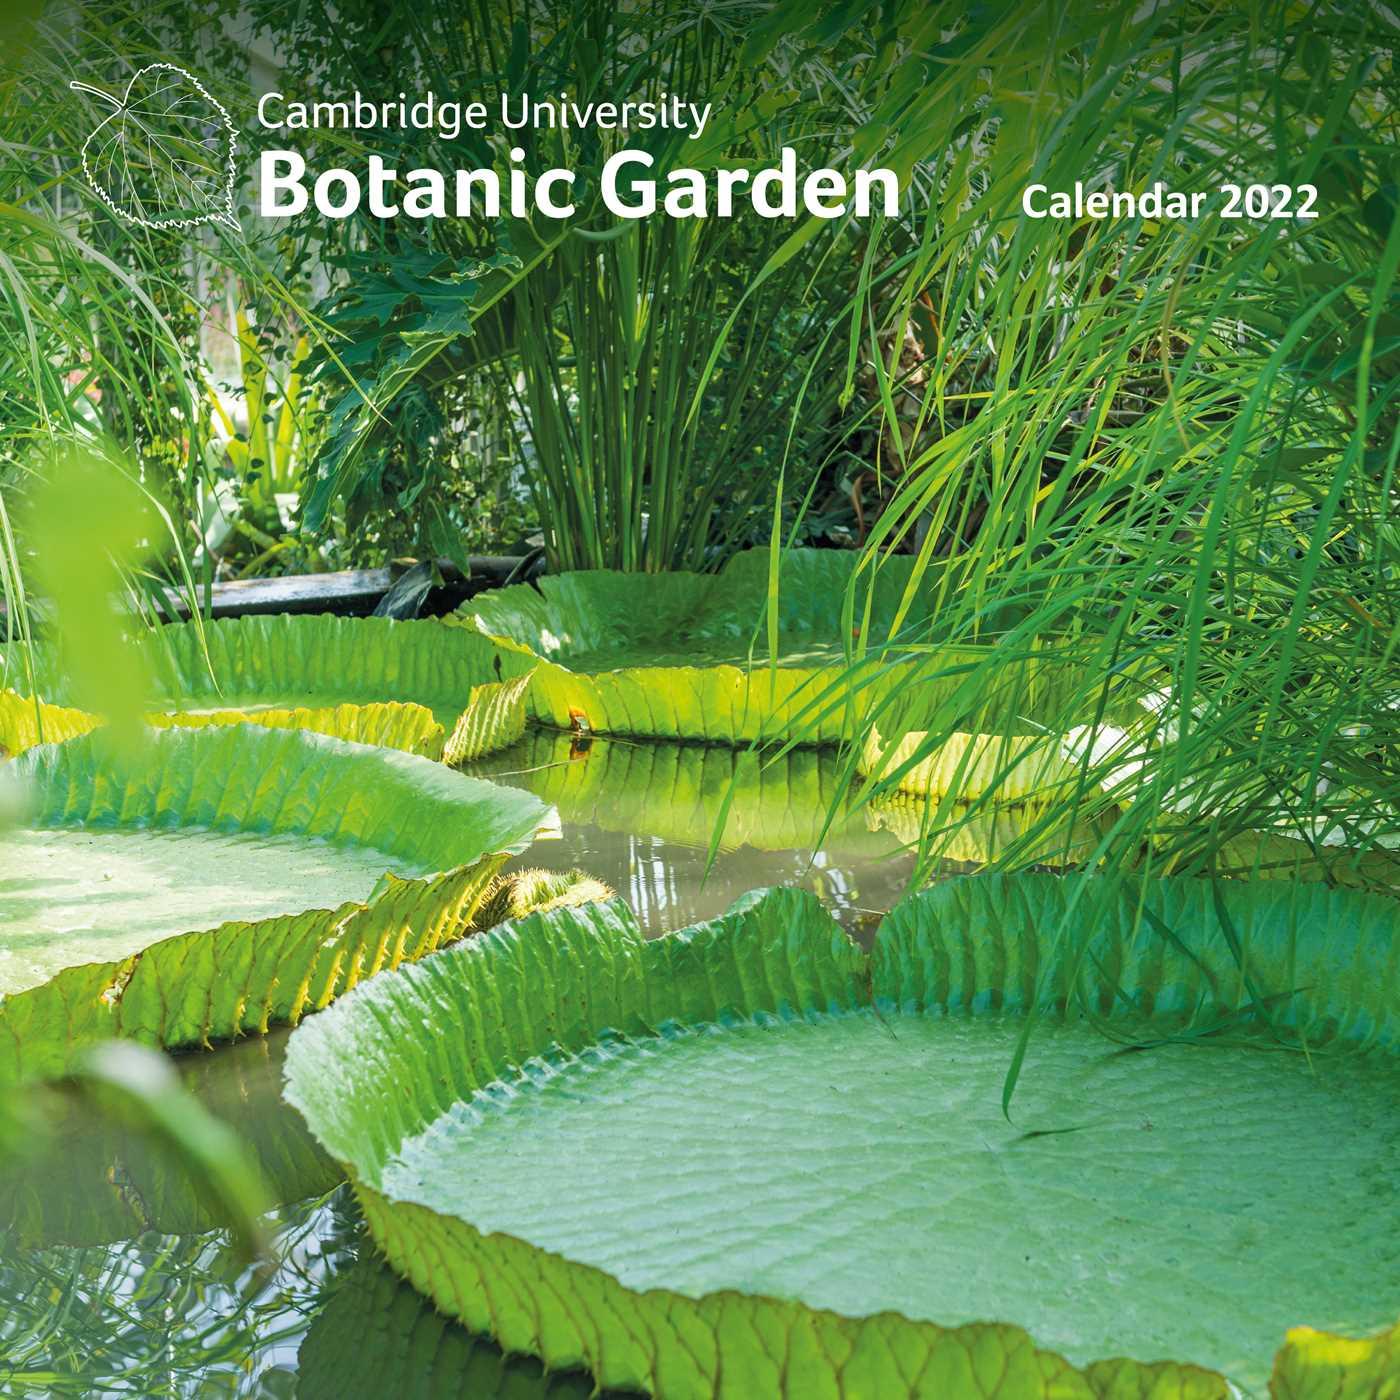 University Of Michigan Calendar 2022.Cambridge University Botanic Garden Wall Calendar 2022 Art Calendar Book Summary Video Official Publisher Page Simon Schuster